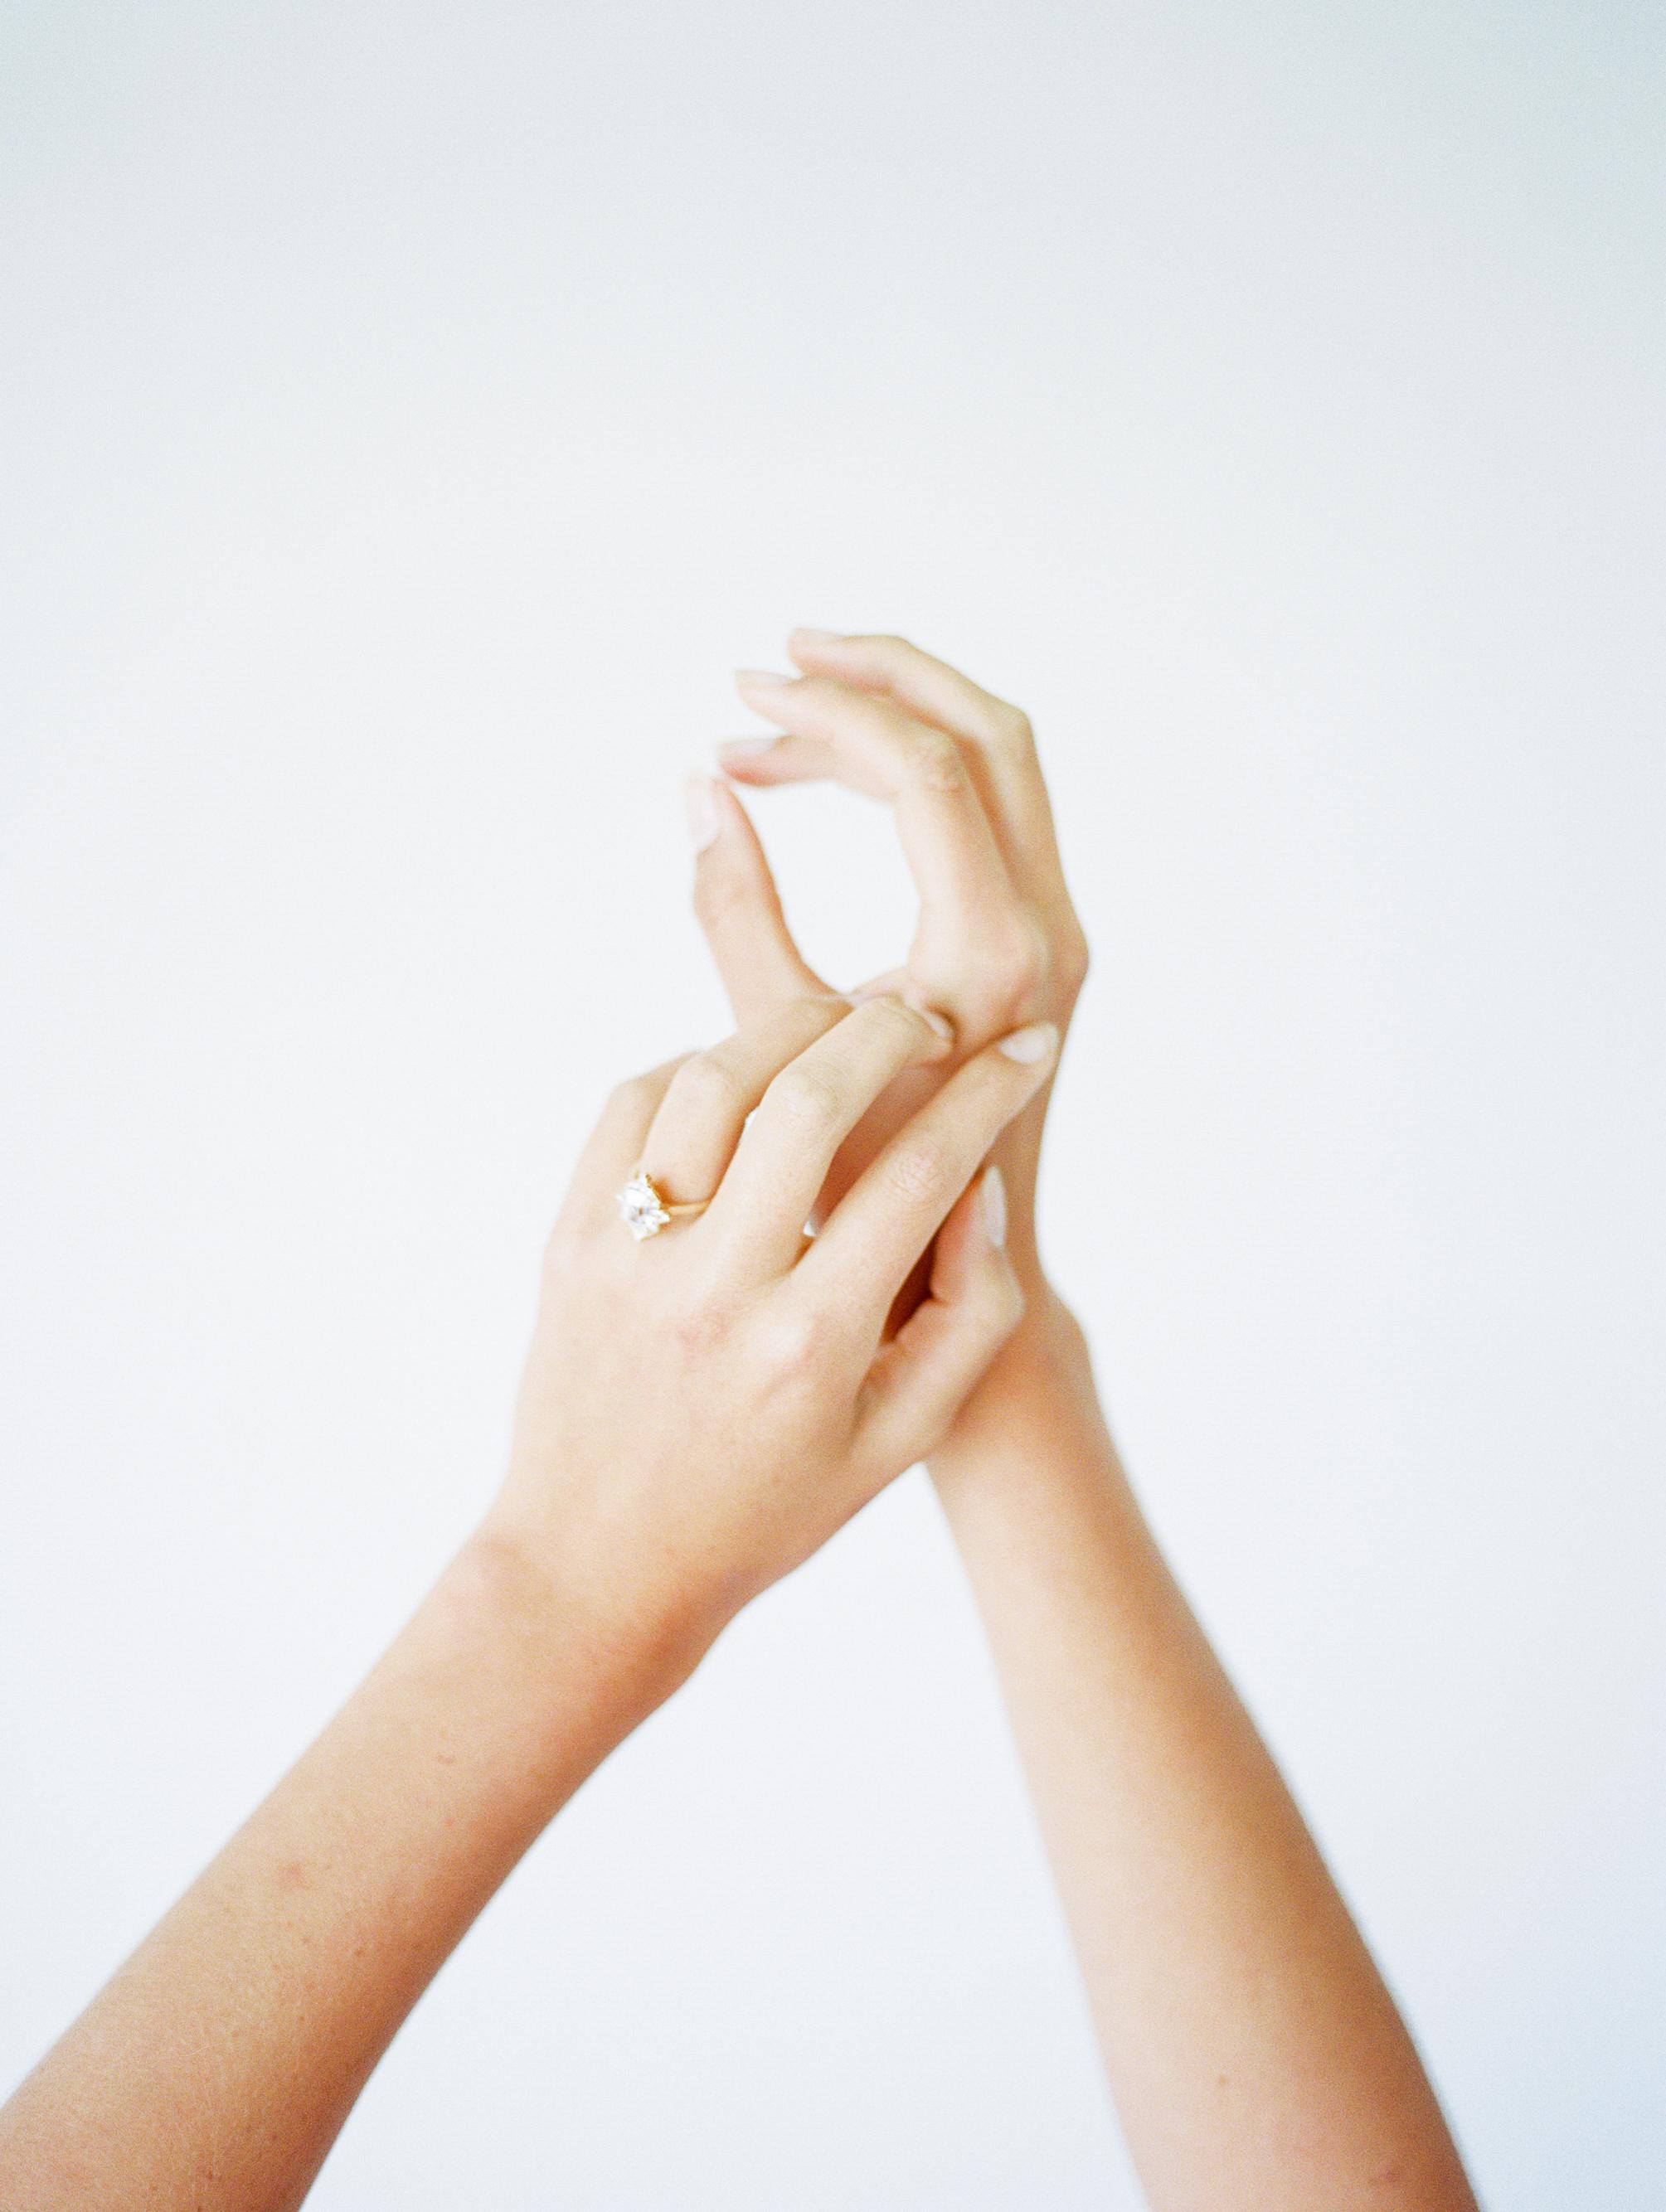 Photography: Jeremy Chou | Styling/Design: Natalie Papova | Calligraphy & Paper Goods: Spurlé Gul Studio | Ring: Susie Saltzman | Model: Devon Powers